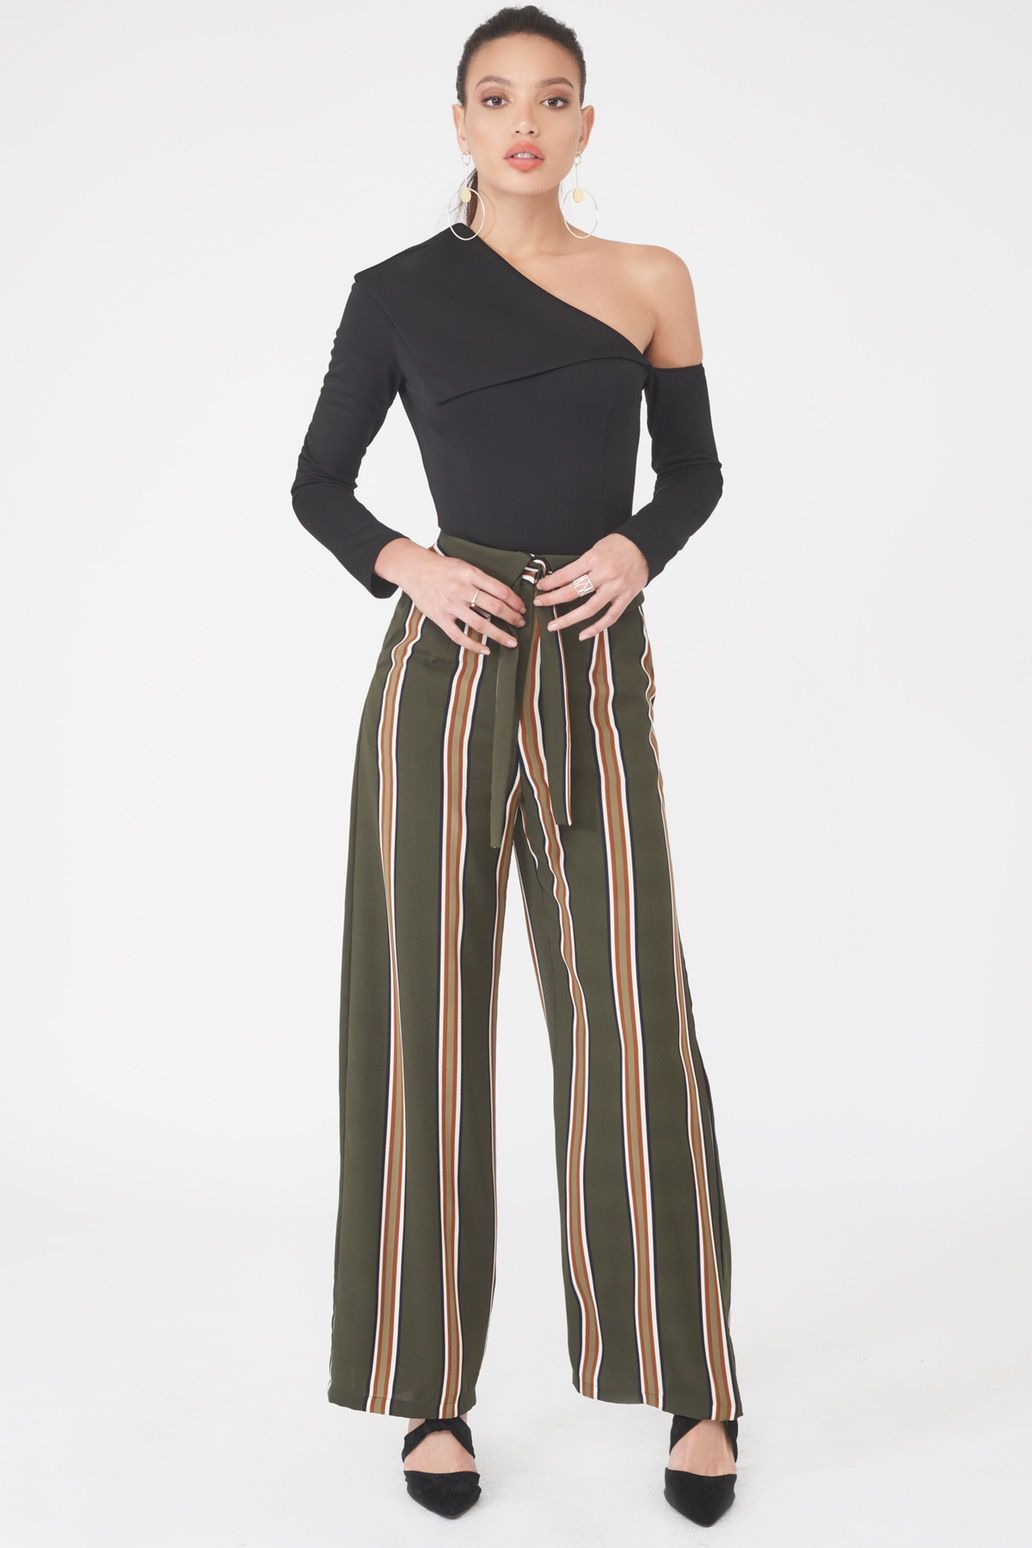 Image of Folded Over Wide Leg Woven Trouser